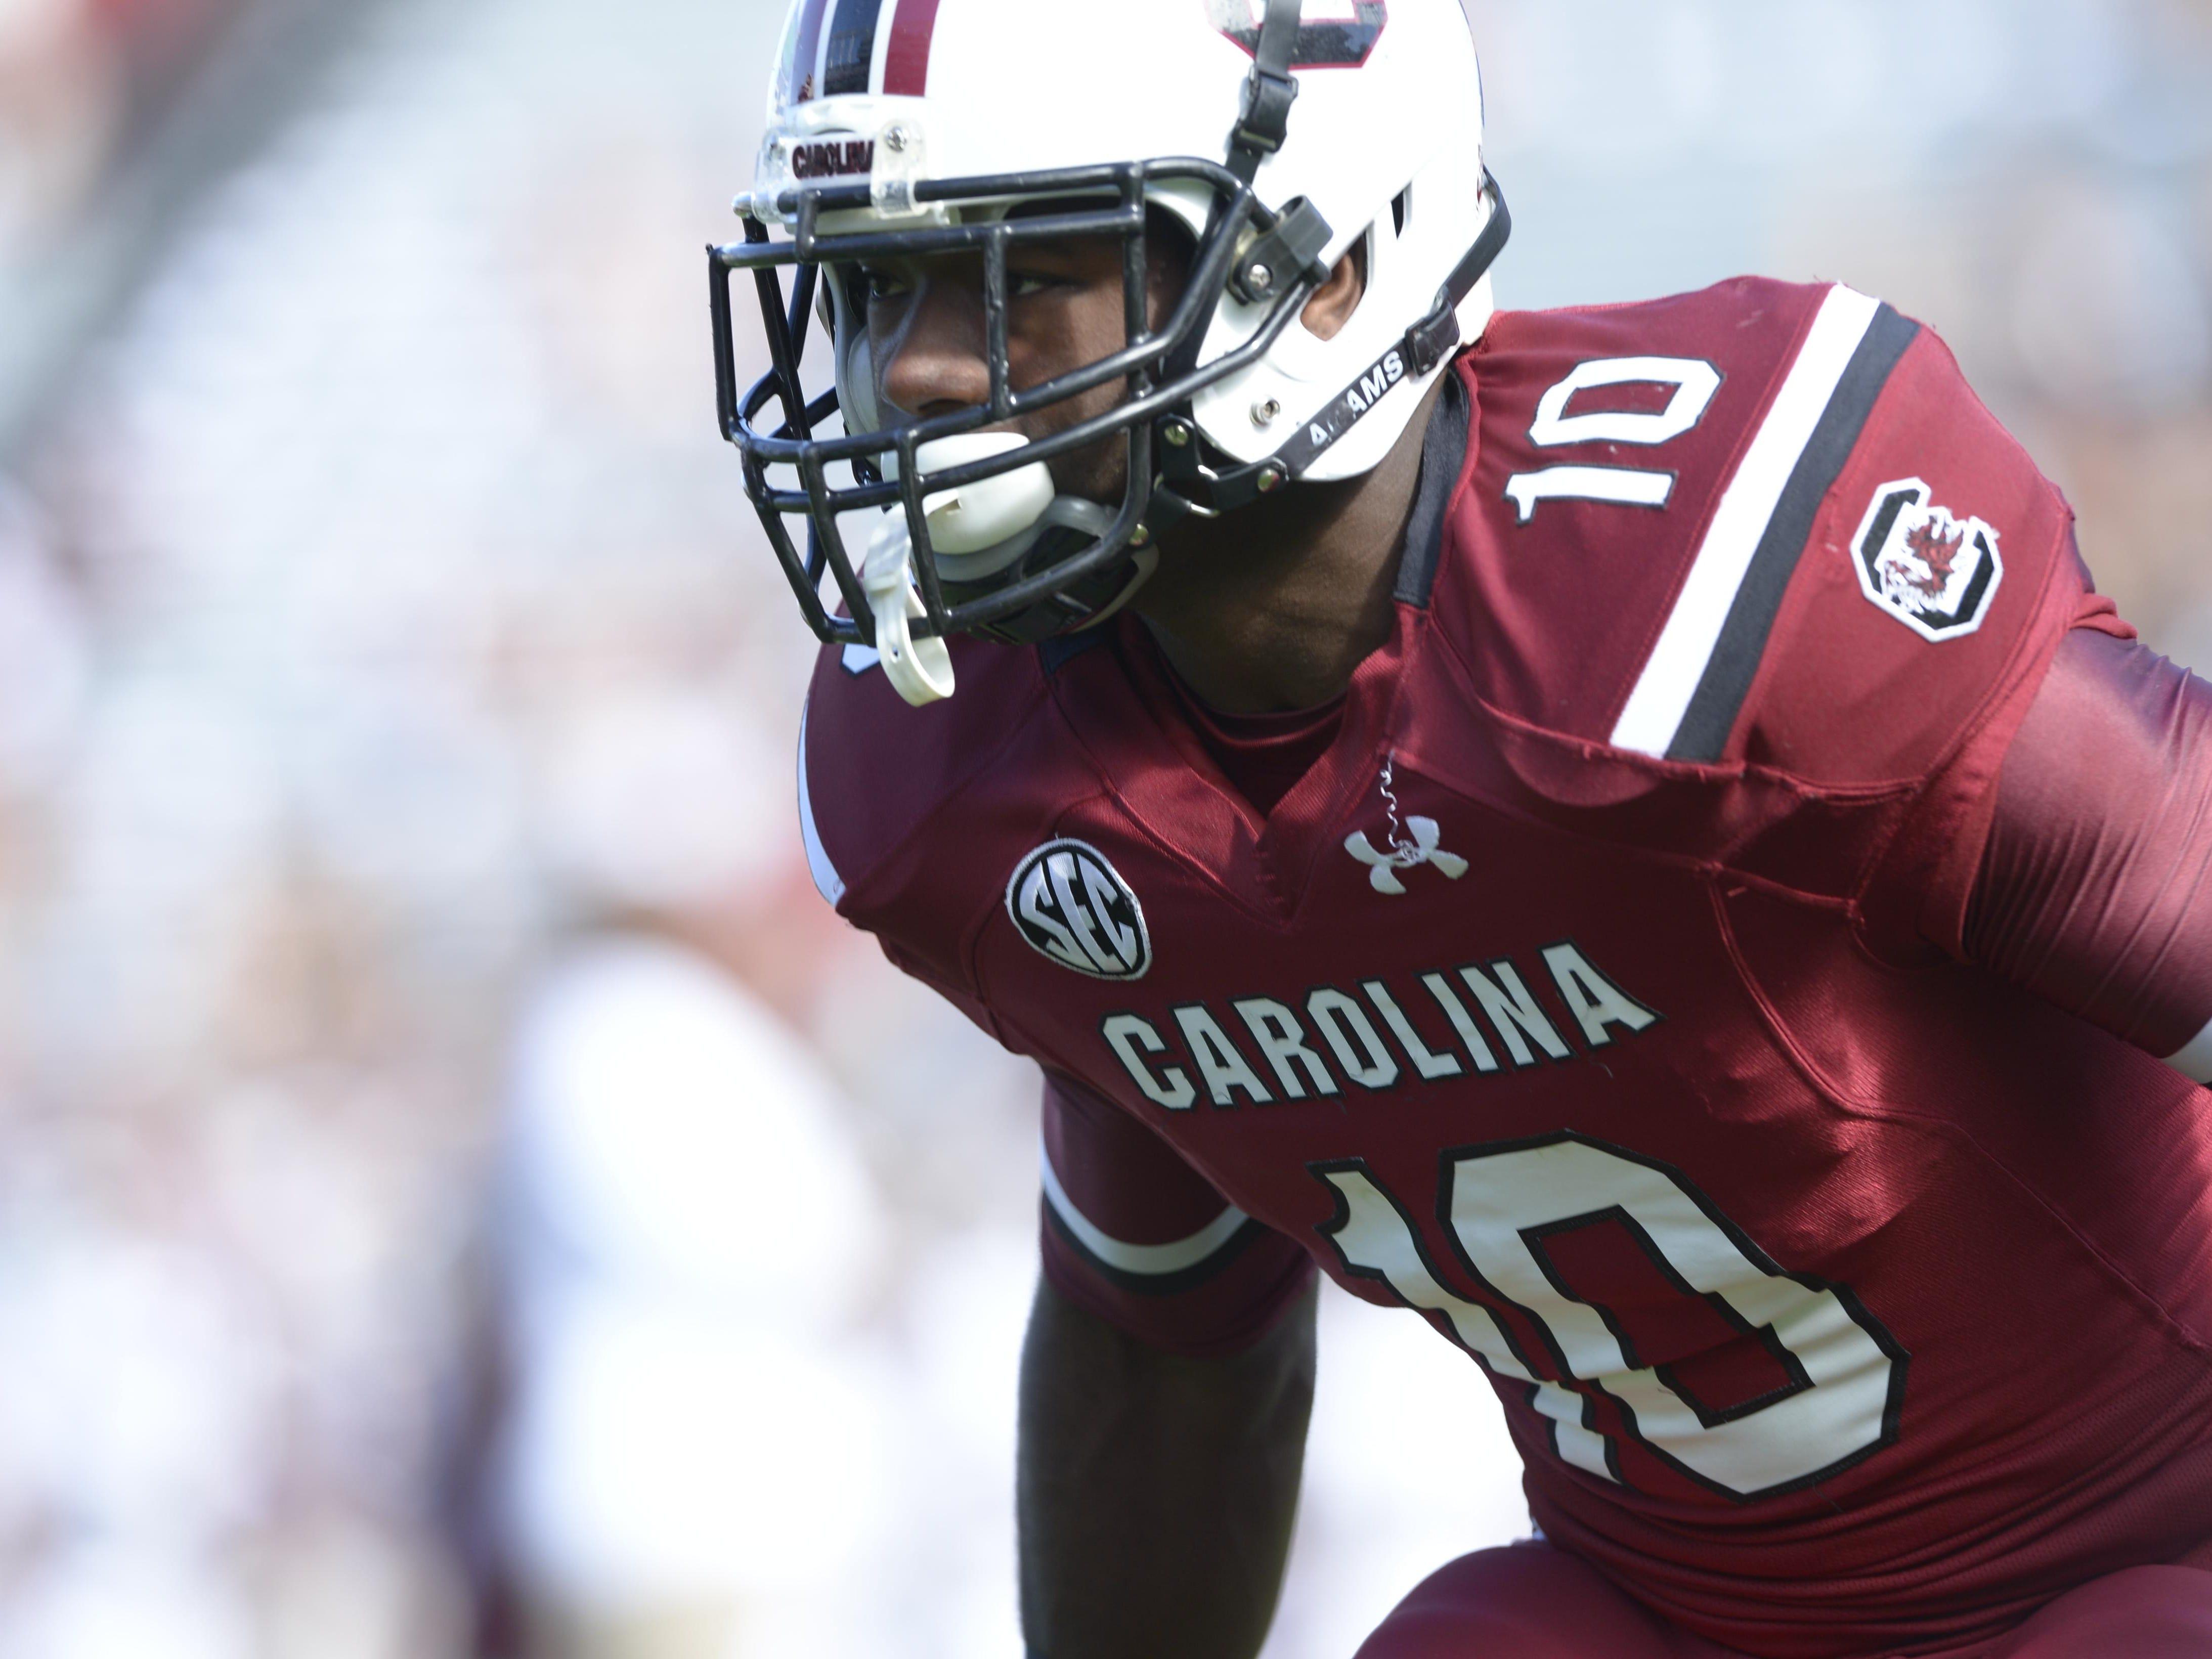 Junior linebacker Skai Moore is confident the Gamecocks will show improvement this season.